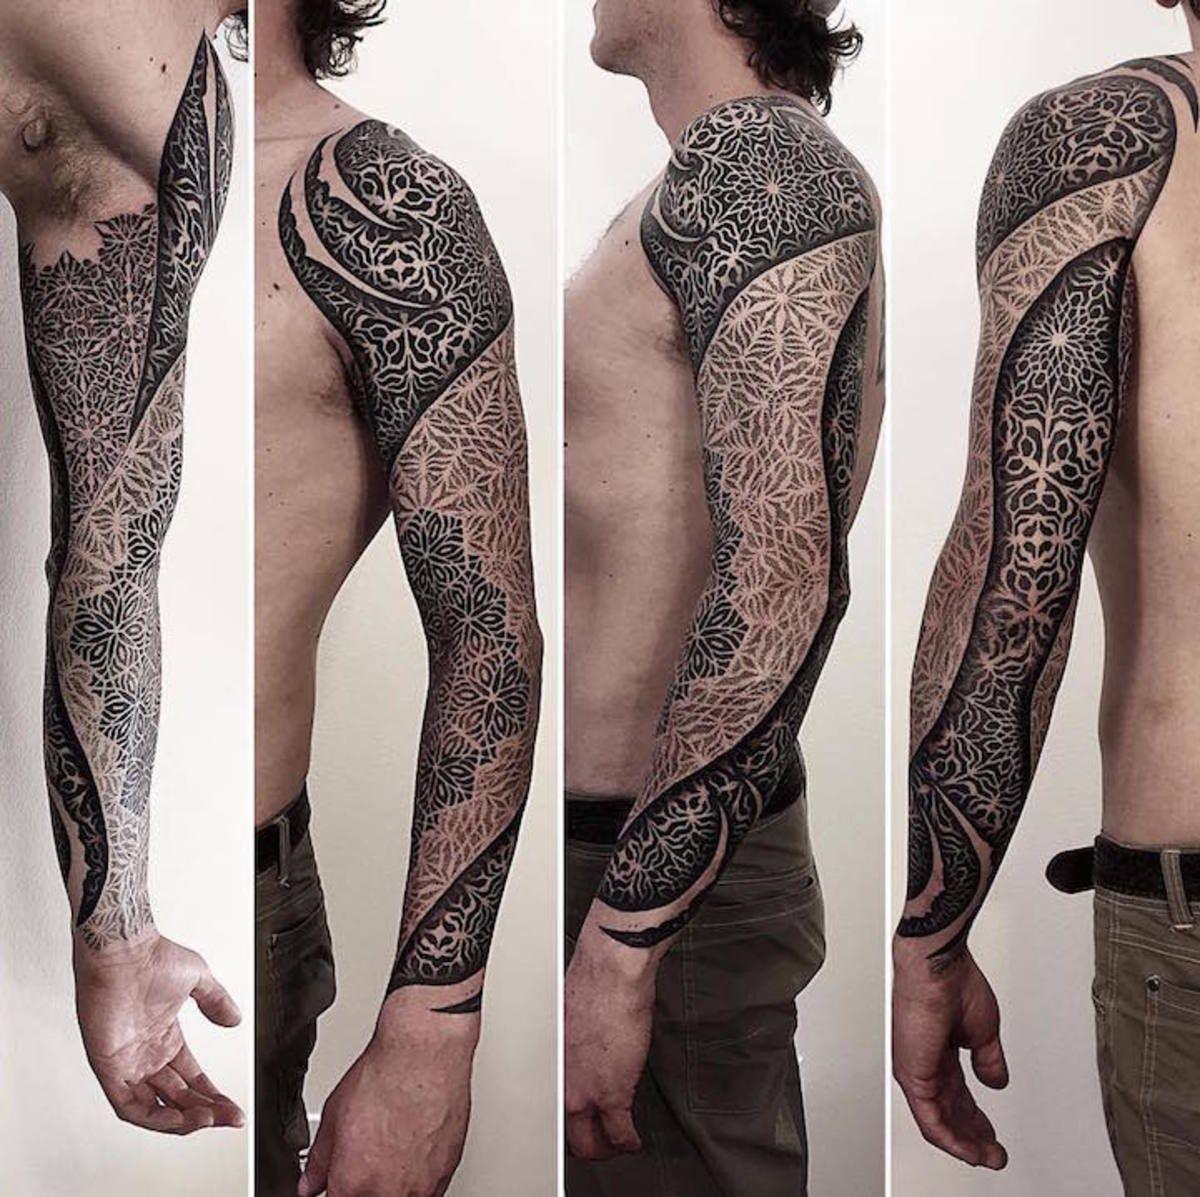 486608c26 Beautifully Complex Geometric Tattoo Sleeves by Brandon Crone - BlazePress  #beautytatoos